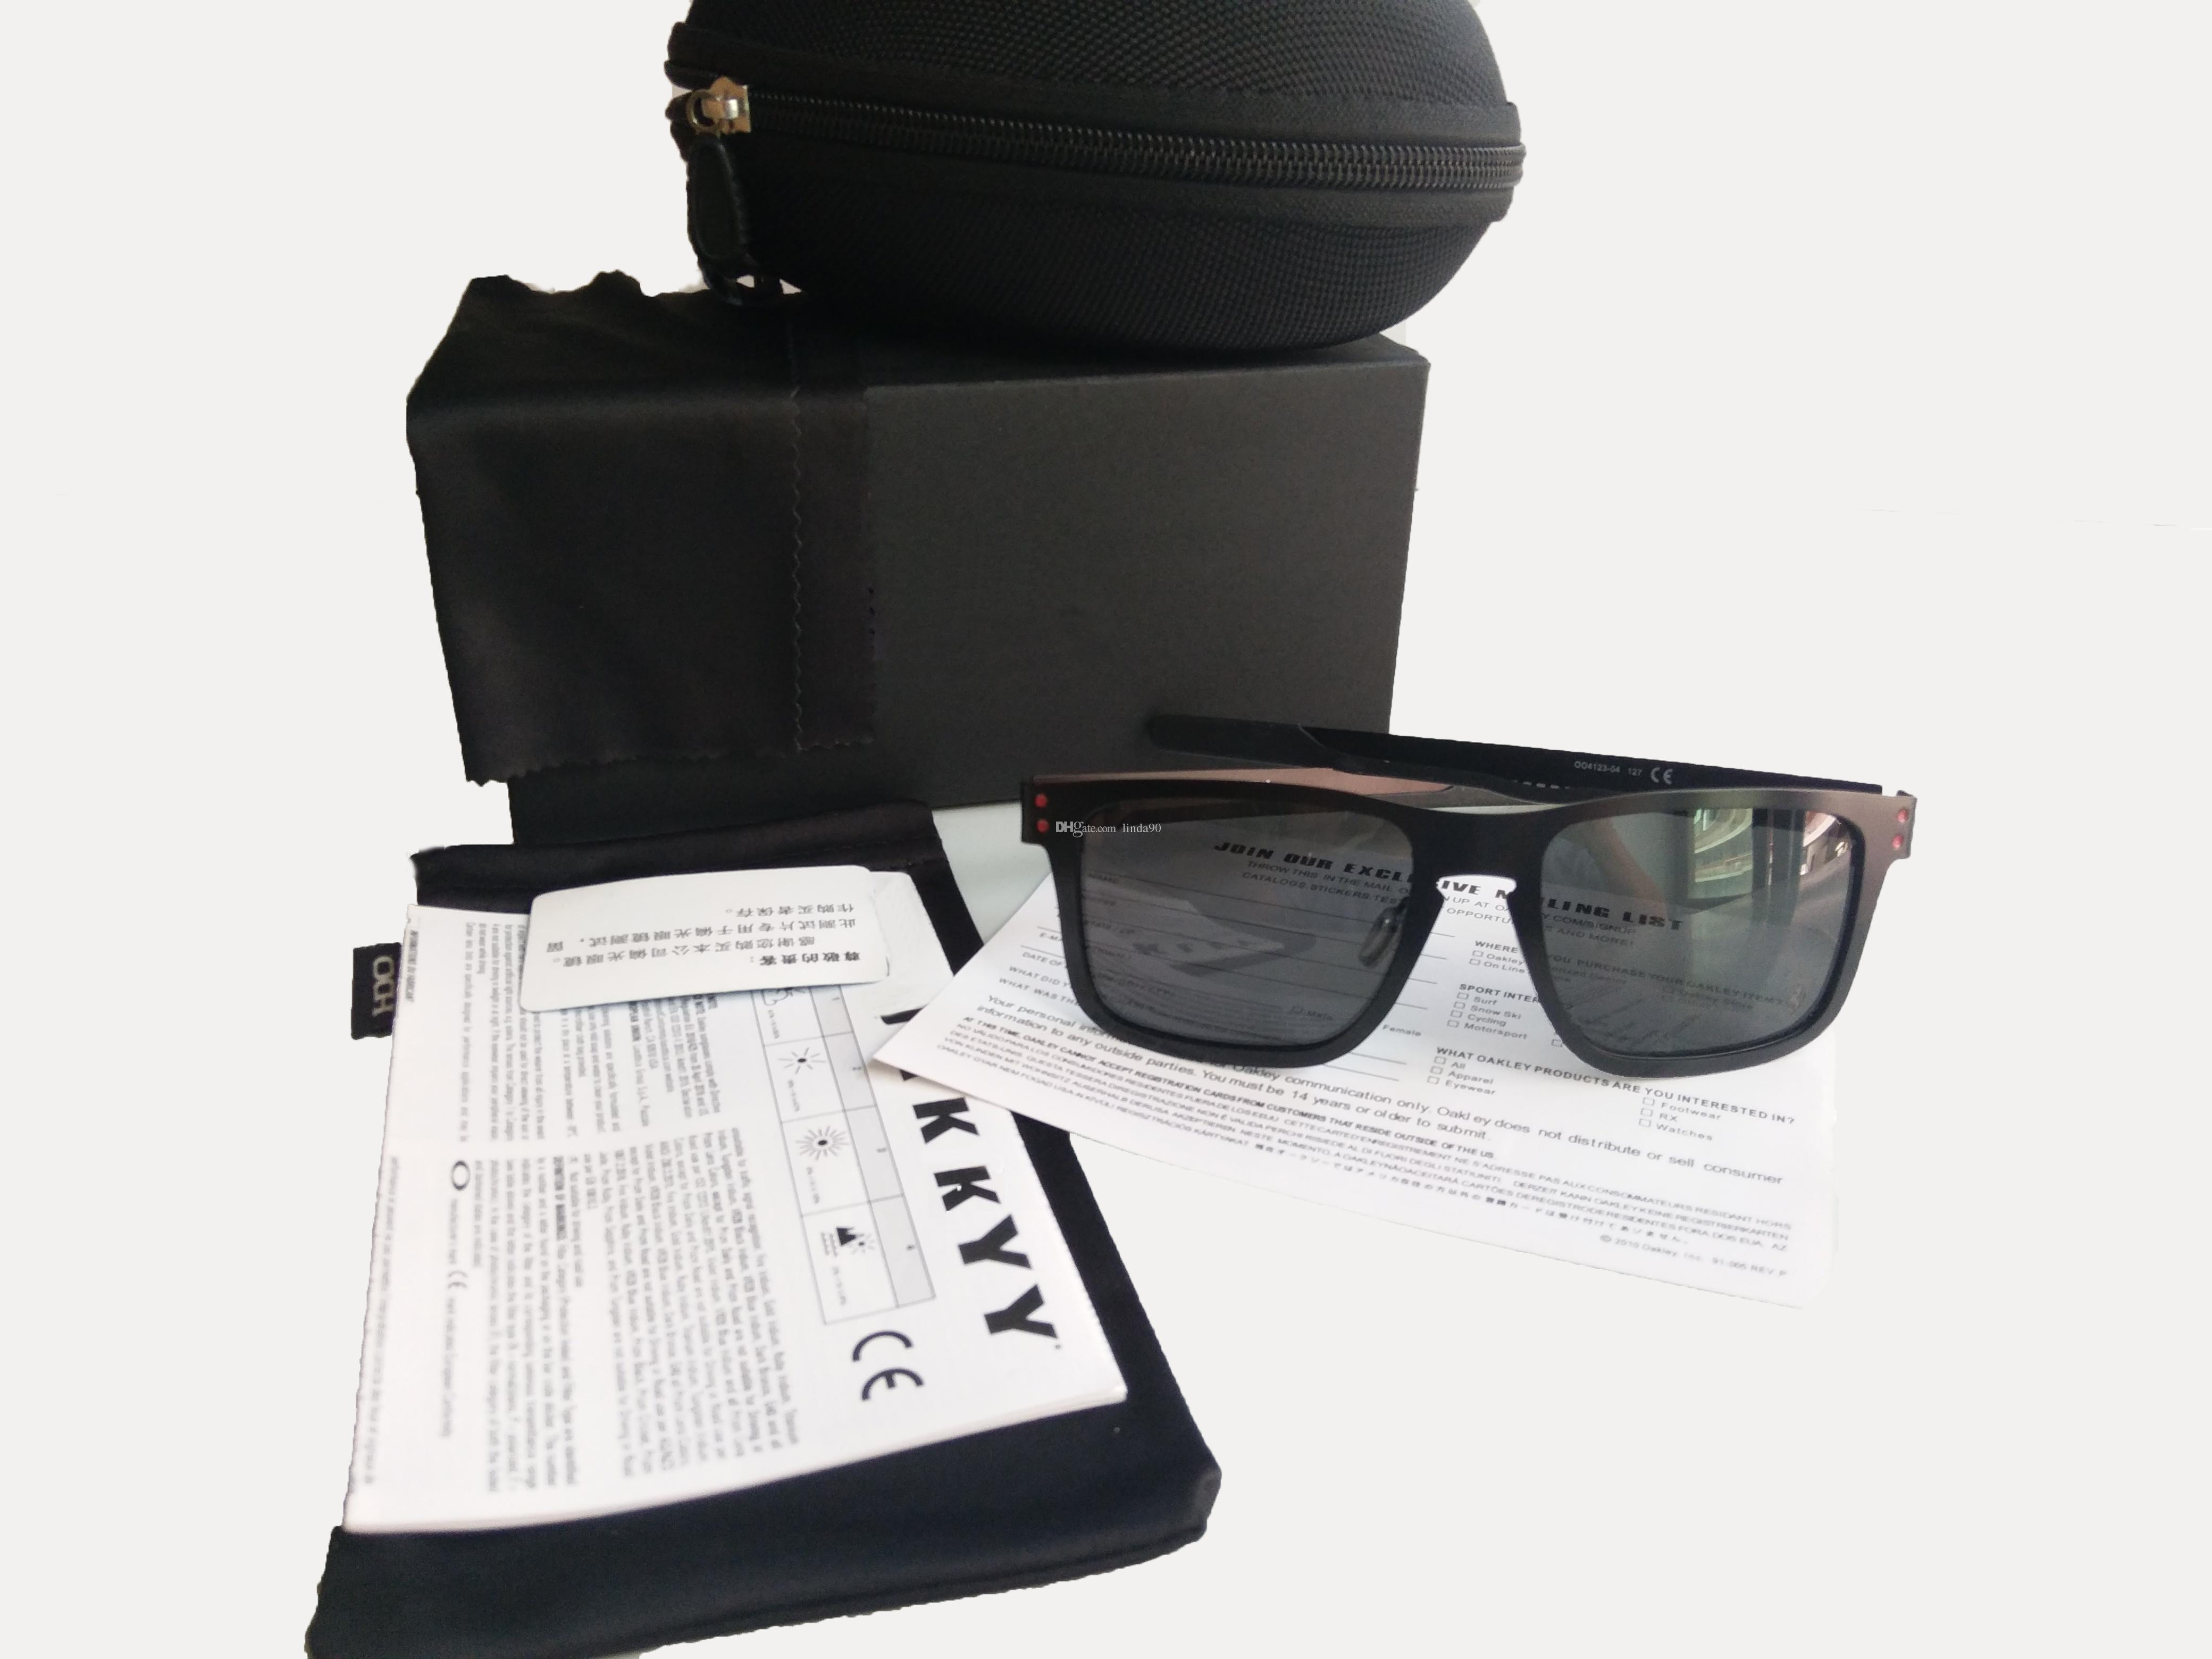 c0bc7d605d8 2019 2017 New Fashion Polarized Sunglasses Men Brand Outdoor Sport Eyewear  Women Googles Sunglasses UV 400 Metal Frame 41032 From Linda90